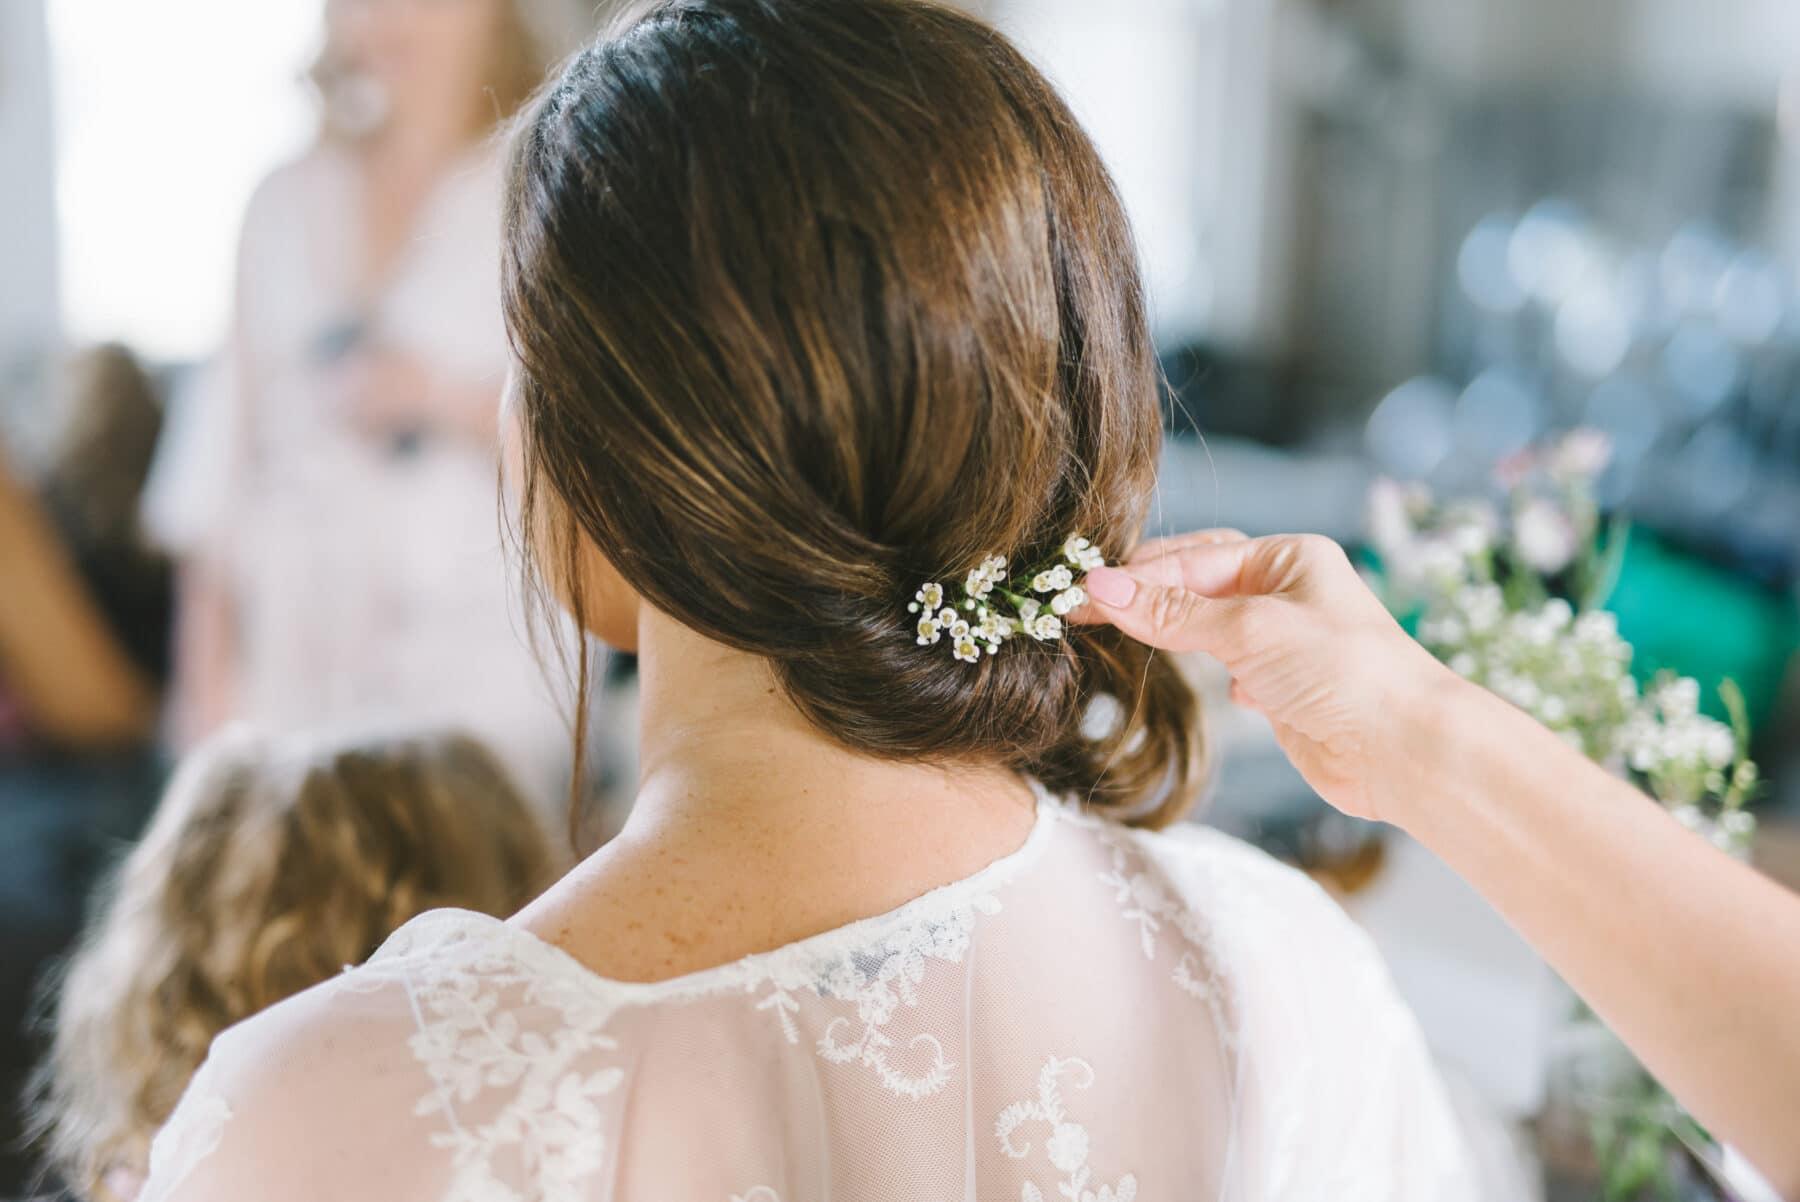 Dainty Floral Wedding Hair Accessory   Nashville Bride Guide